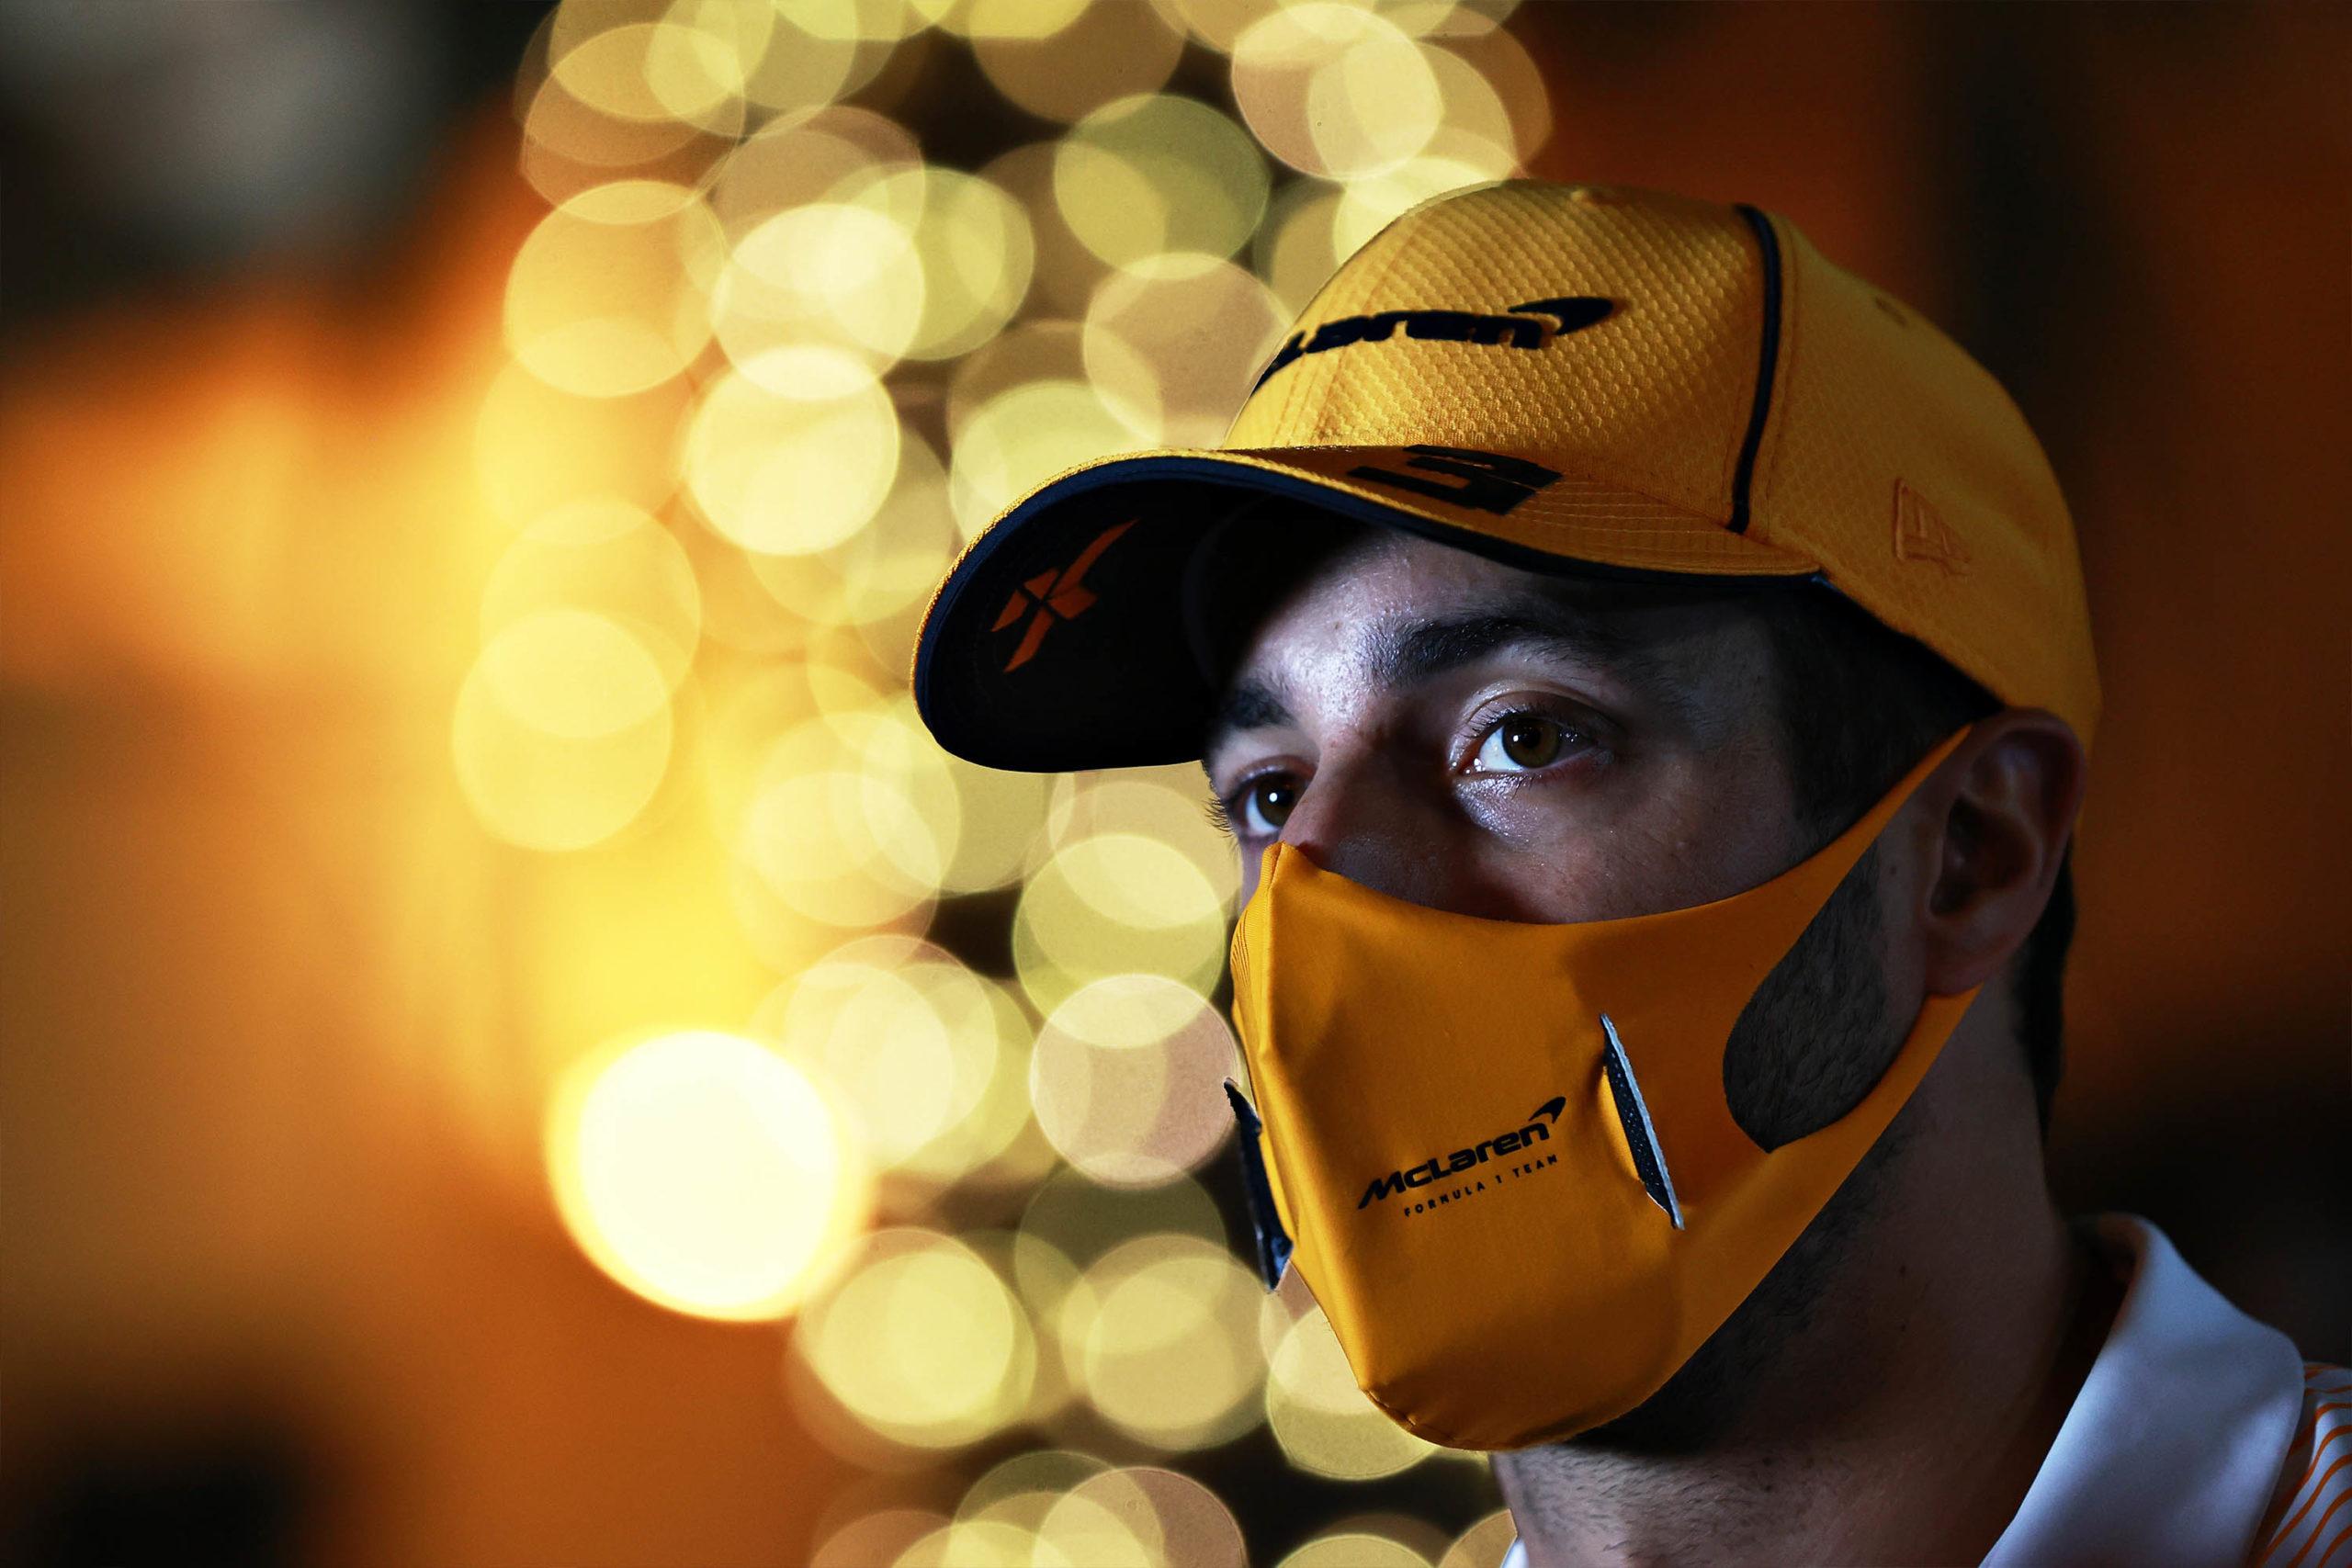 Daniel-Ricciardo-in-Bahrain-for-the-2021-GP